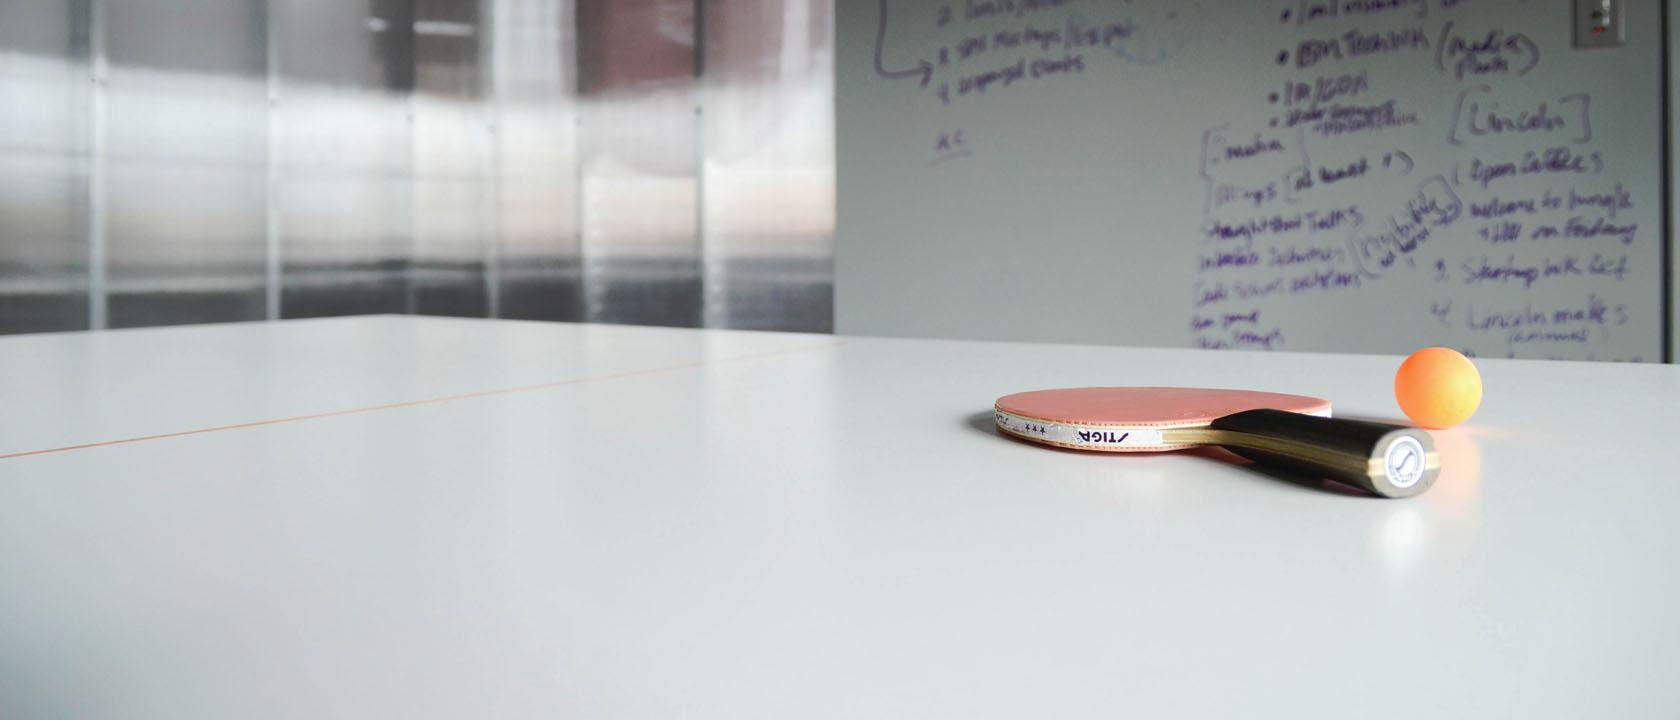 Medidas mesas de ping pong mesa de ping pong profesional for Dimensiones mesa ping pong